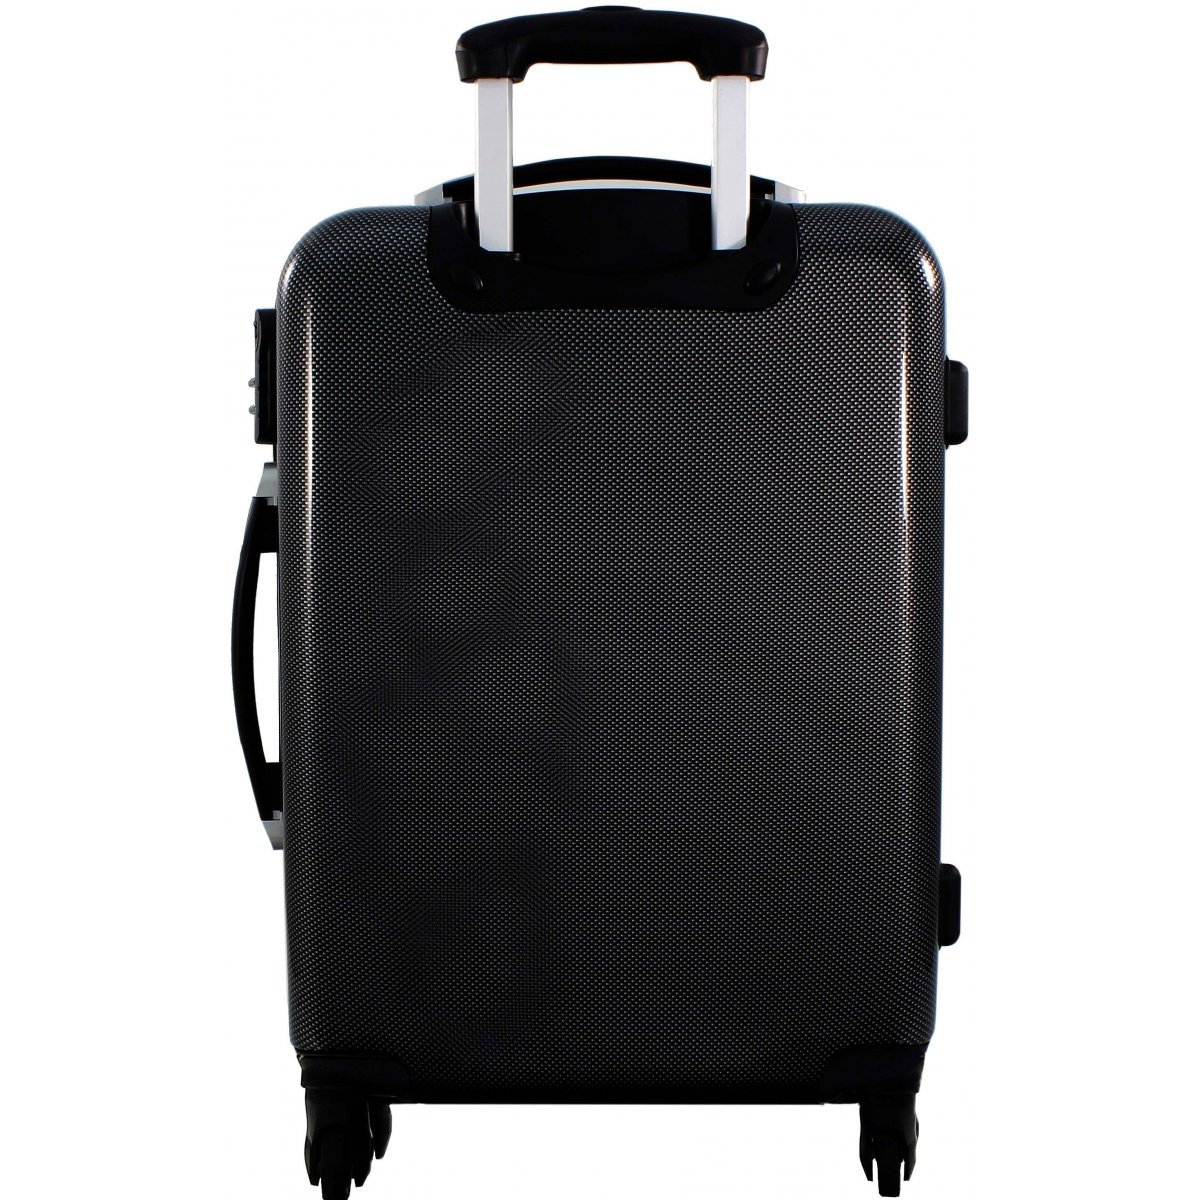 Lot 2 valises 1 vanity david jones y20013 couleur principale black squa - Valise a prix discount ...